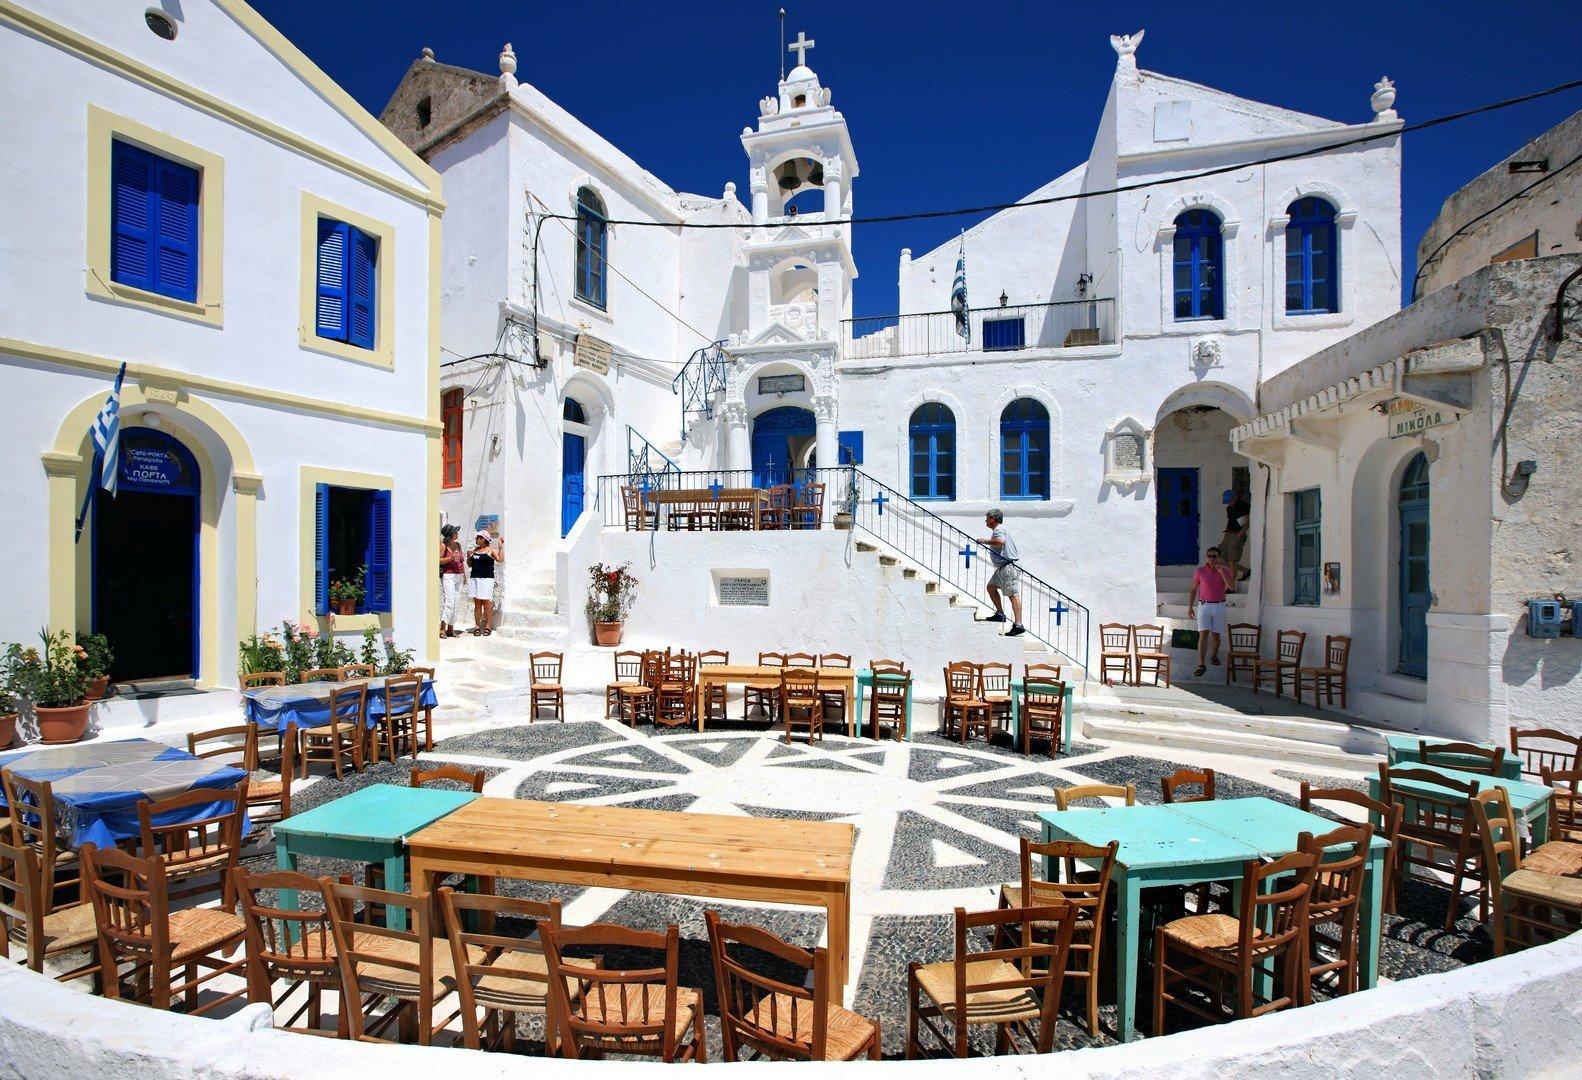 Porta square at Nikia village, Nisyros Island shutterstock_68700916